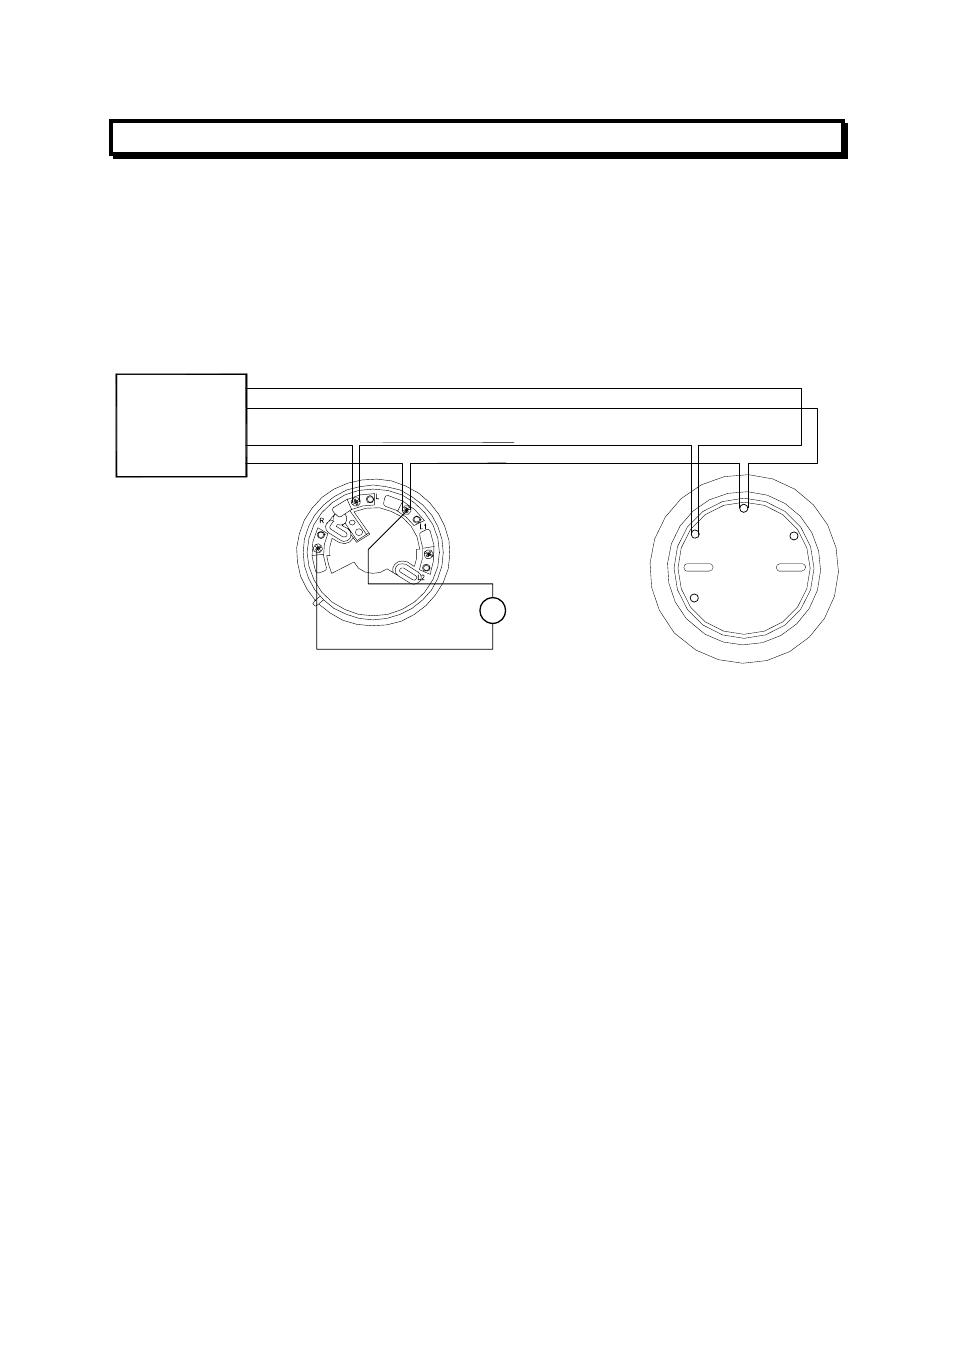 medium resolution of 11 mub universal base 1 general 2 mub and 5b wiring tyco mx4428 user manual page 41 134